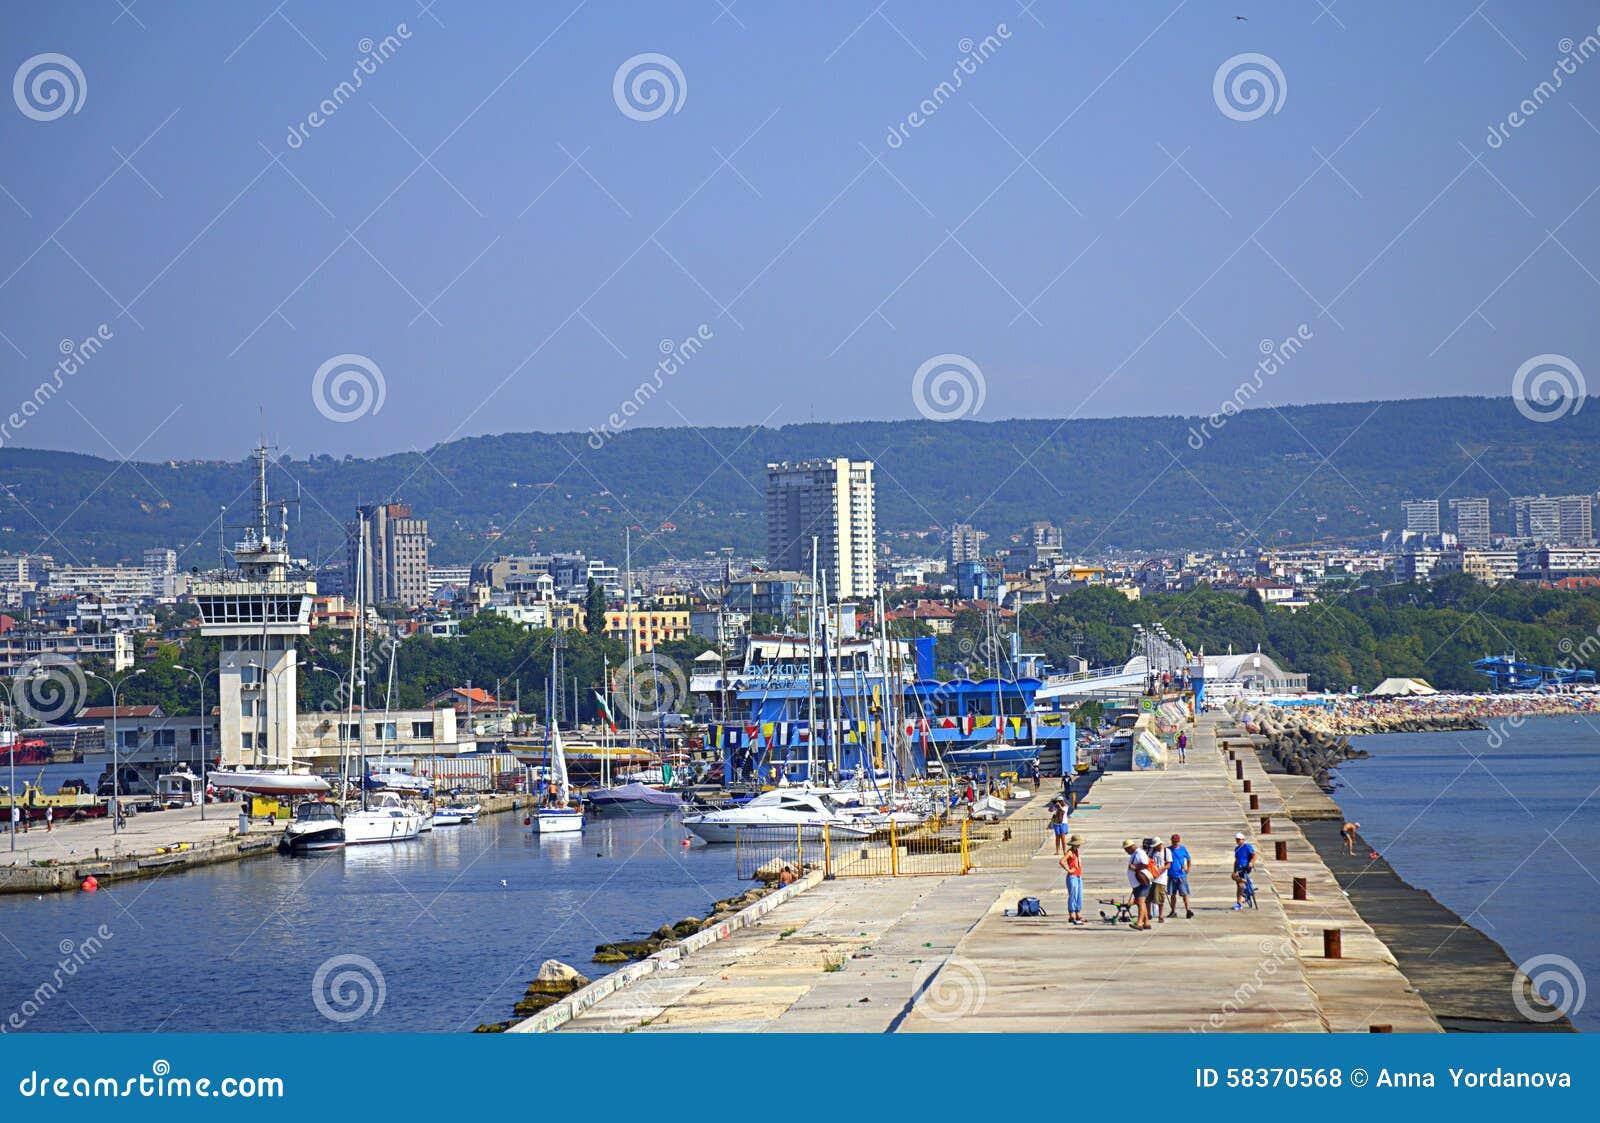 Varna City View Bulgaria Editorial Stock Photo Image